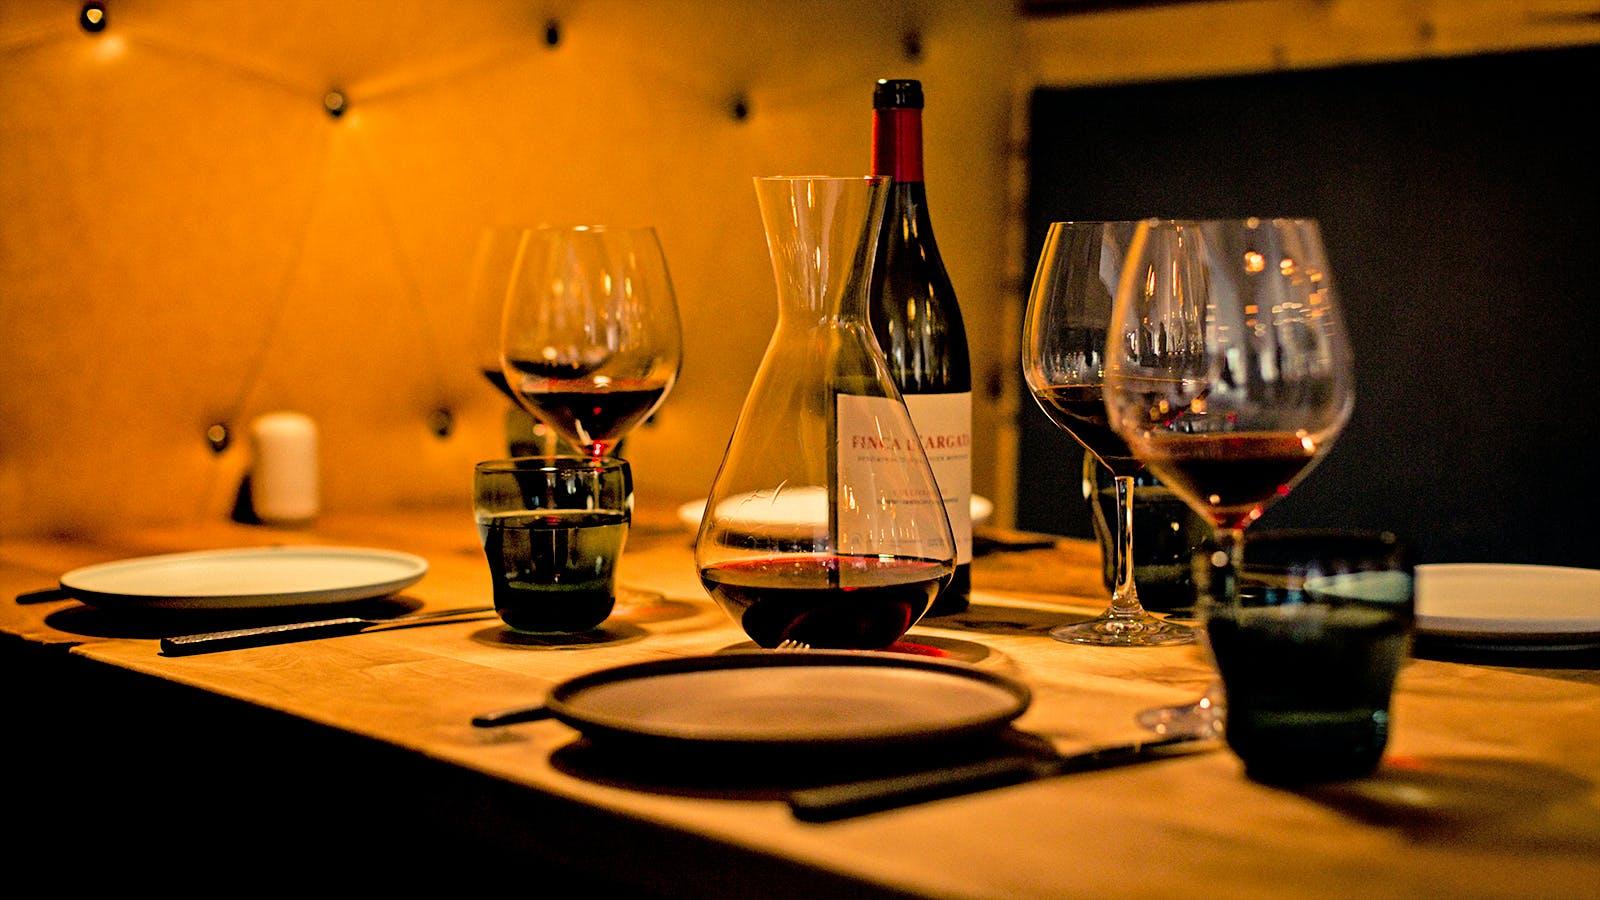 11 Restaurants Offering the Finest Spanish Wines